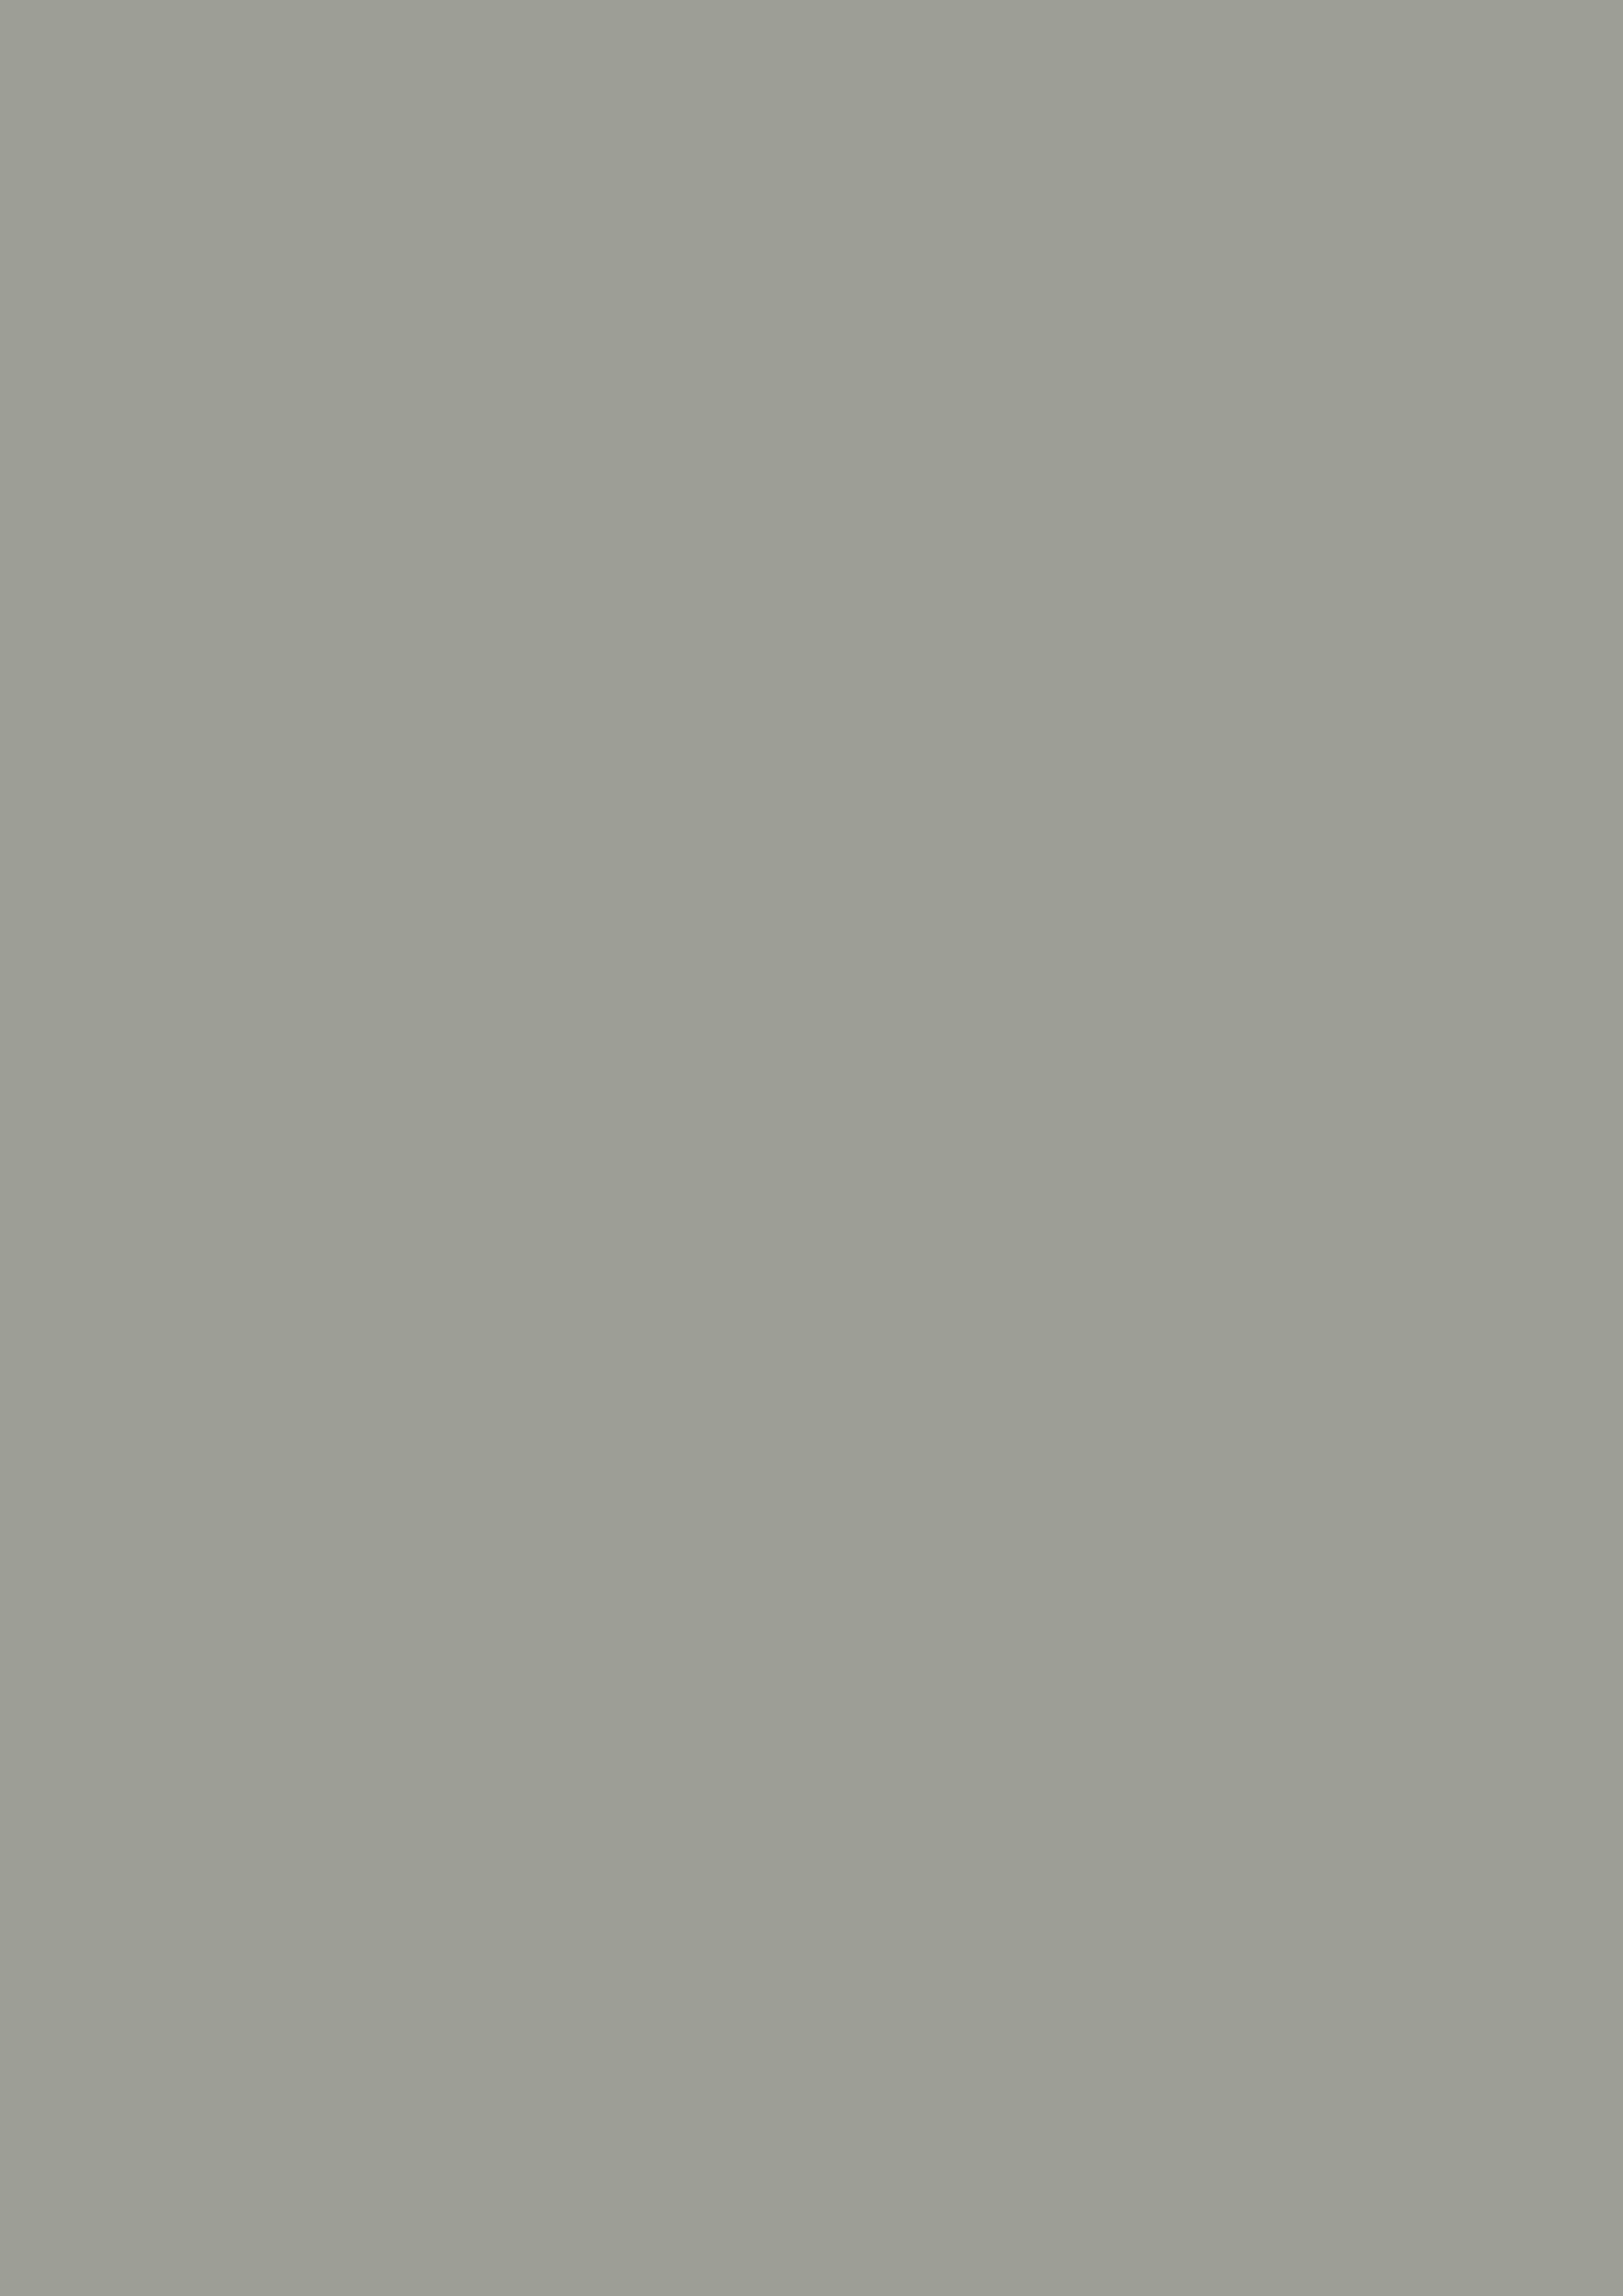 Pigeon adler wohndesign for Wohndesign charlottenburg